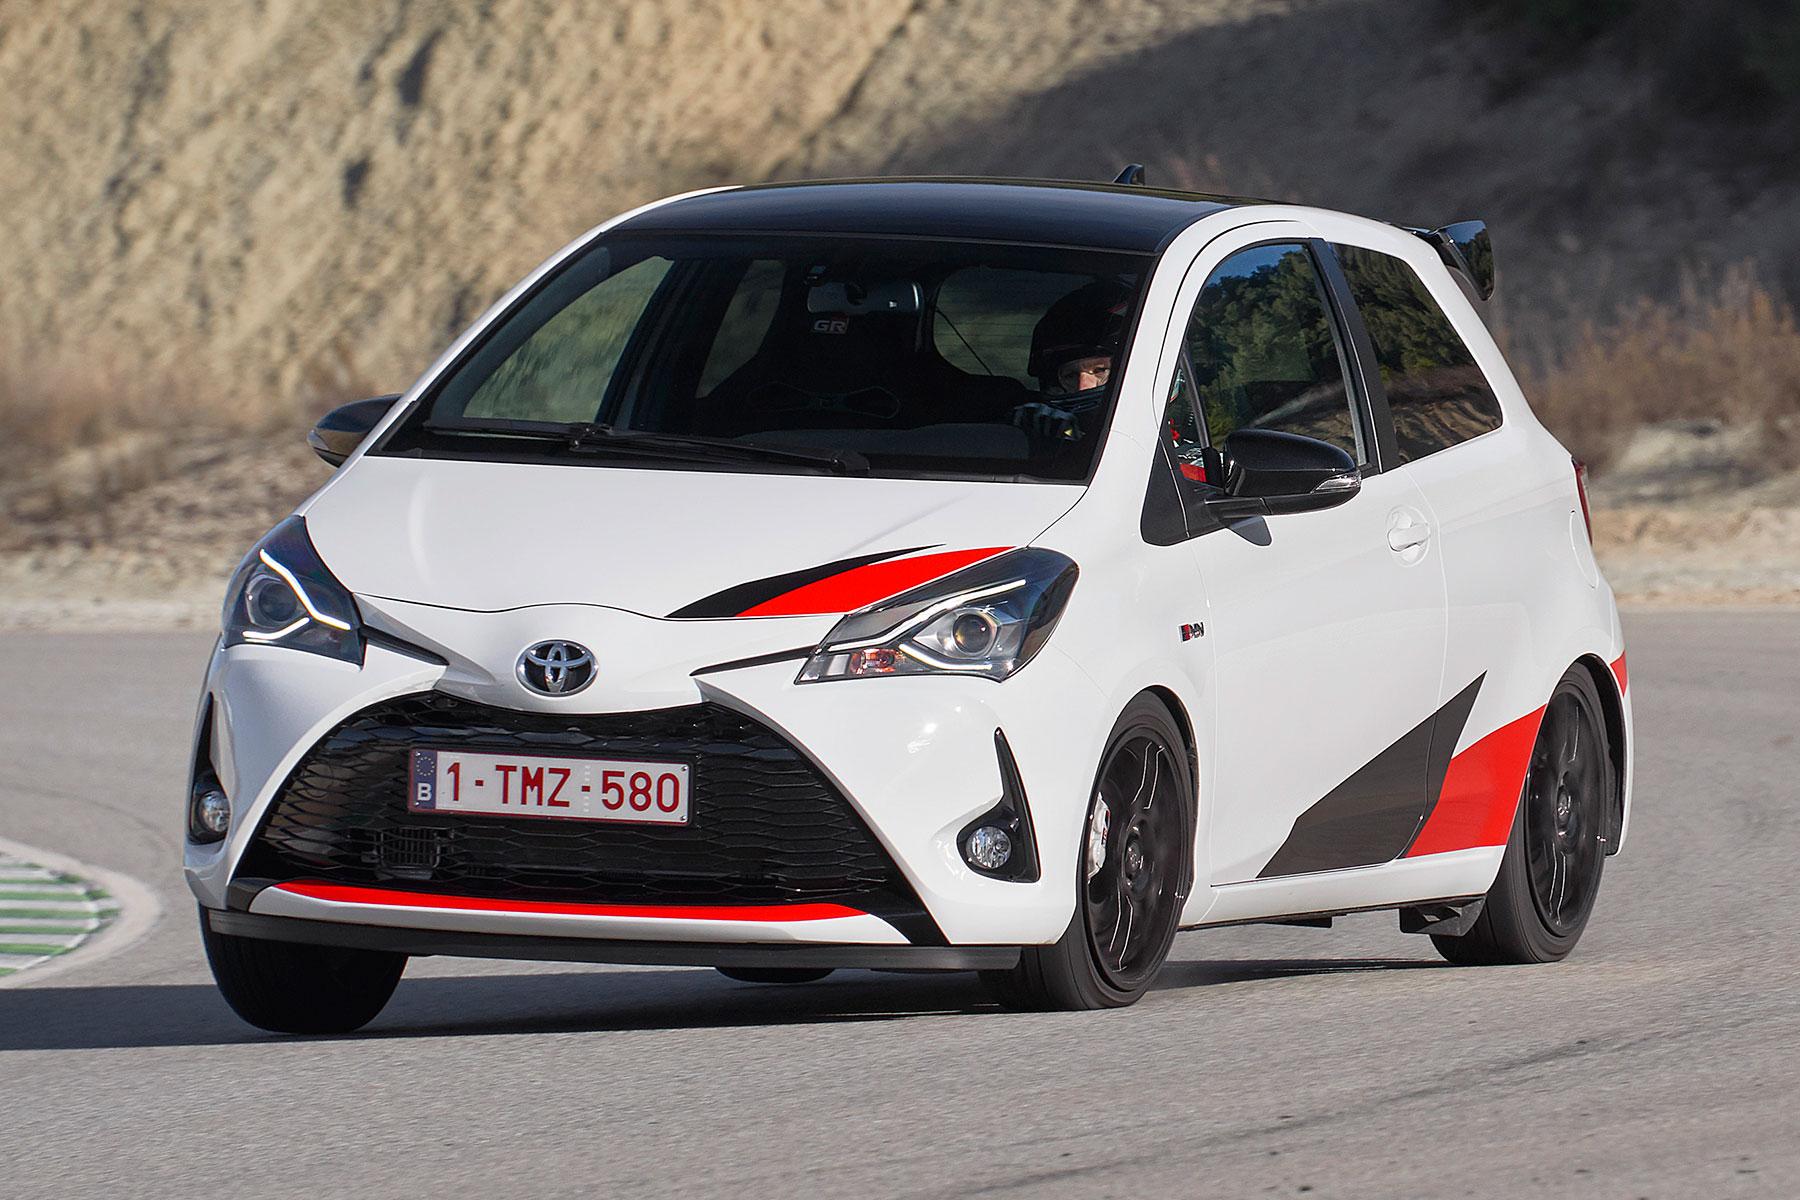 cfba9cc5abf4 Yaris GRMN review  on-track in Toyota s hardcore hatch